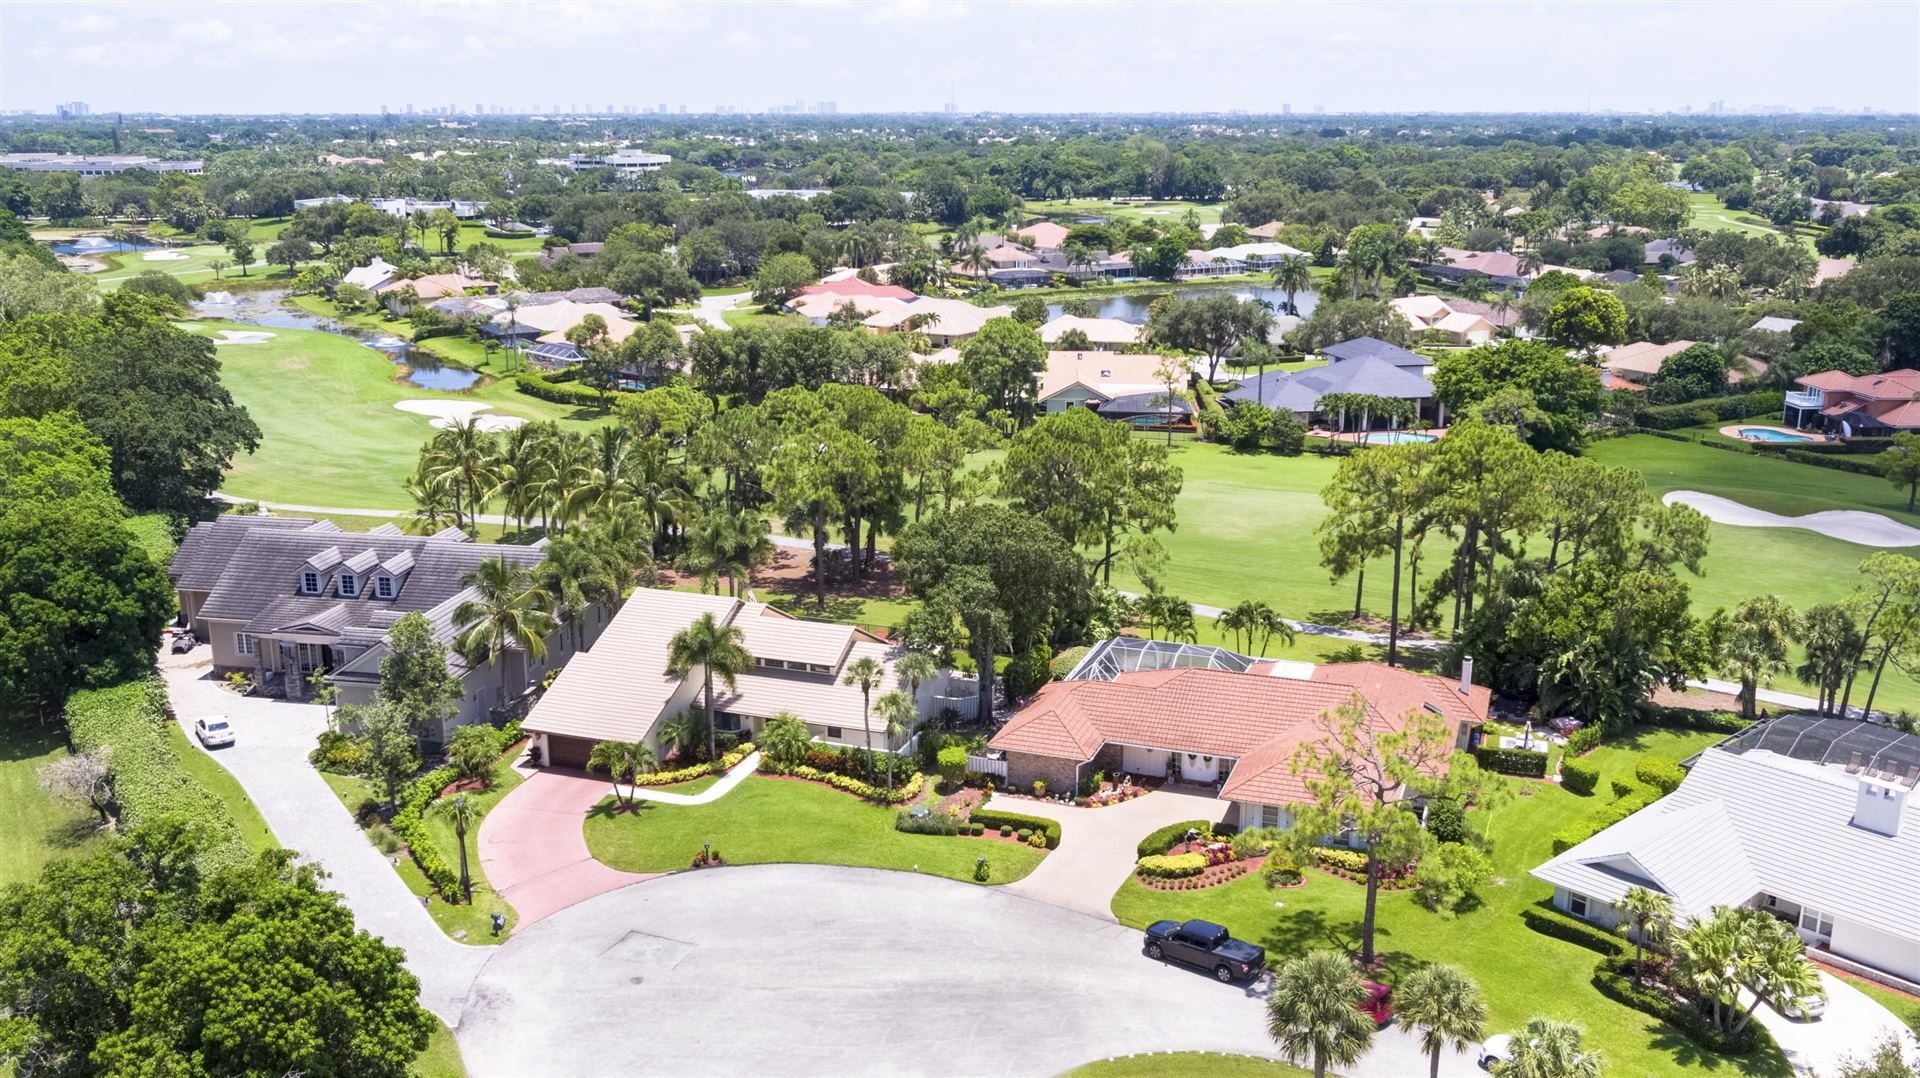 Photo of 11 Berwick Road, Palm Beach Gardens, FL 33418 (MLS # RX-10642783)